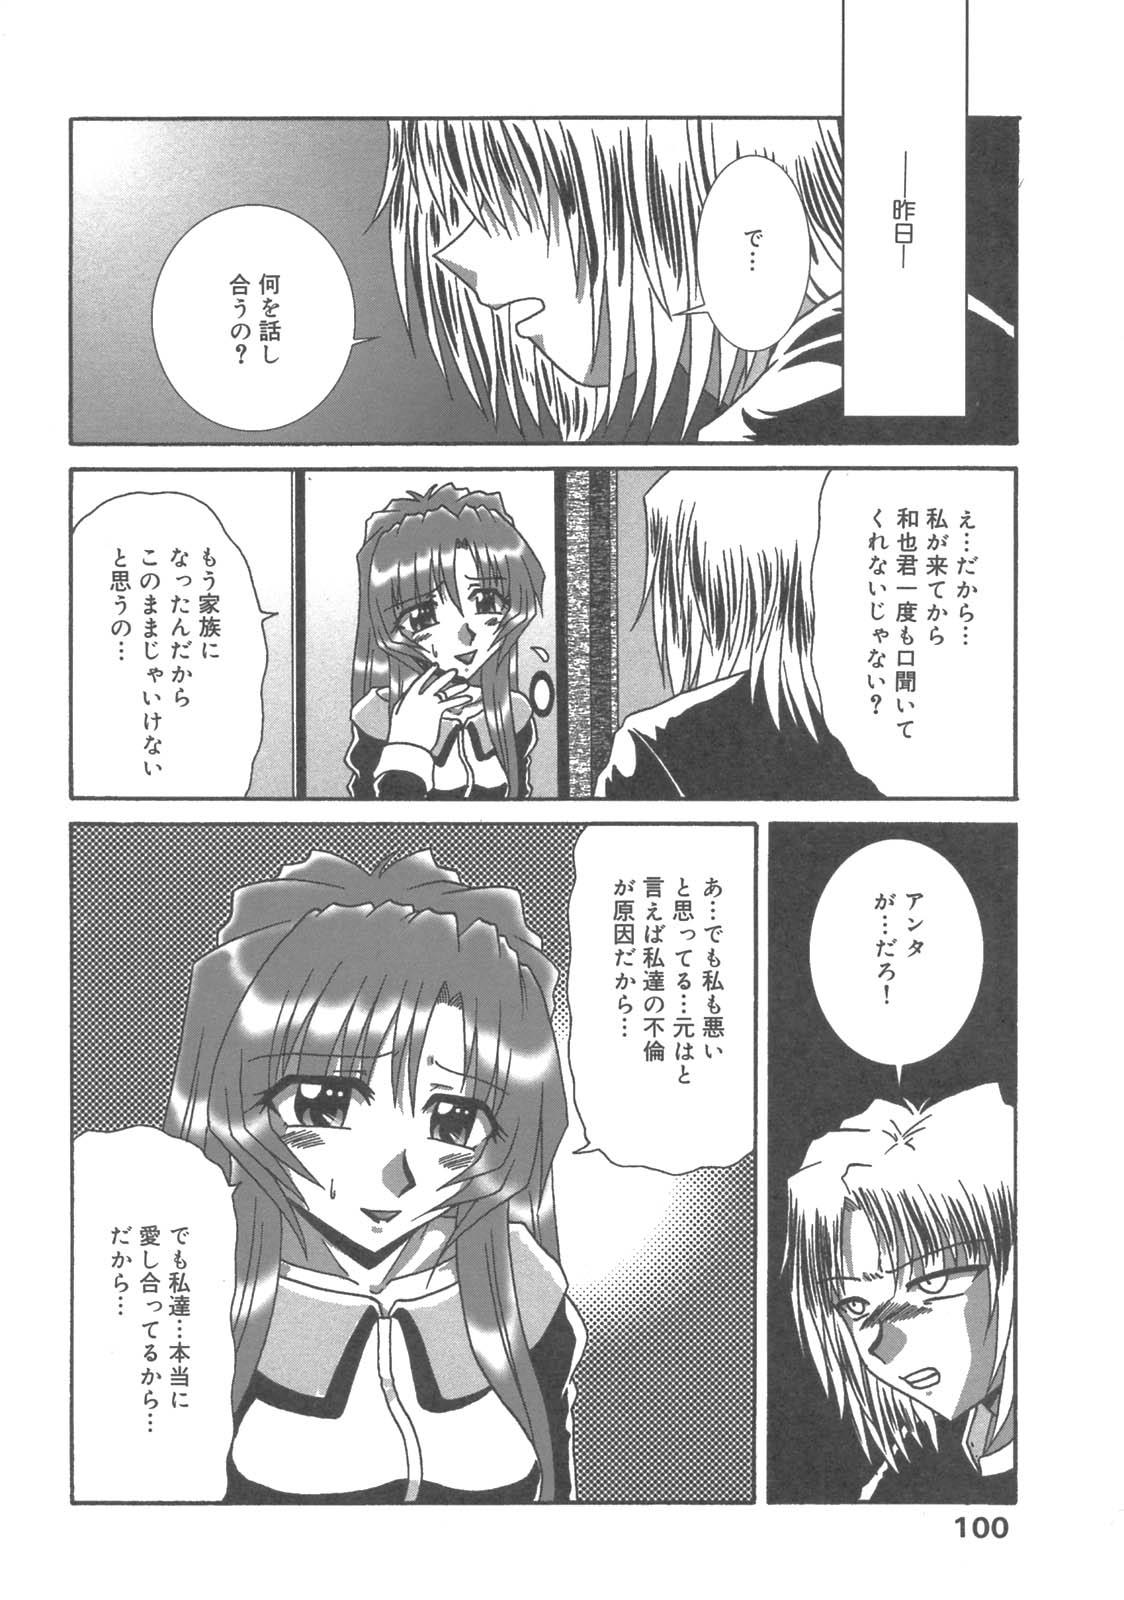 Kanbo Choukyou Sora 96